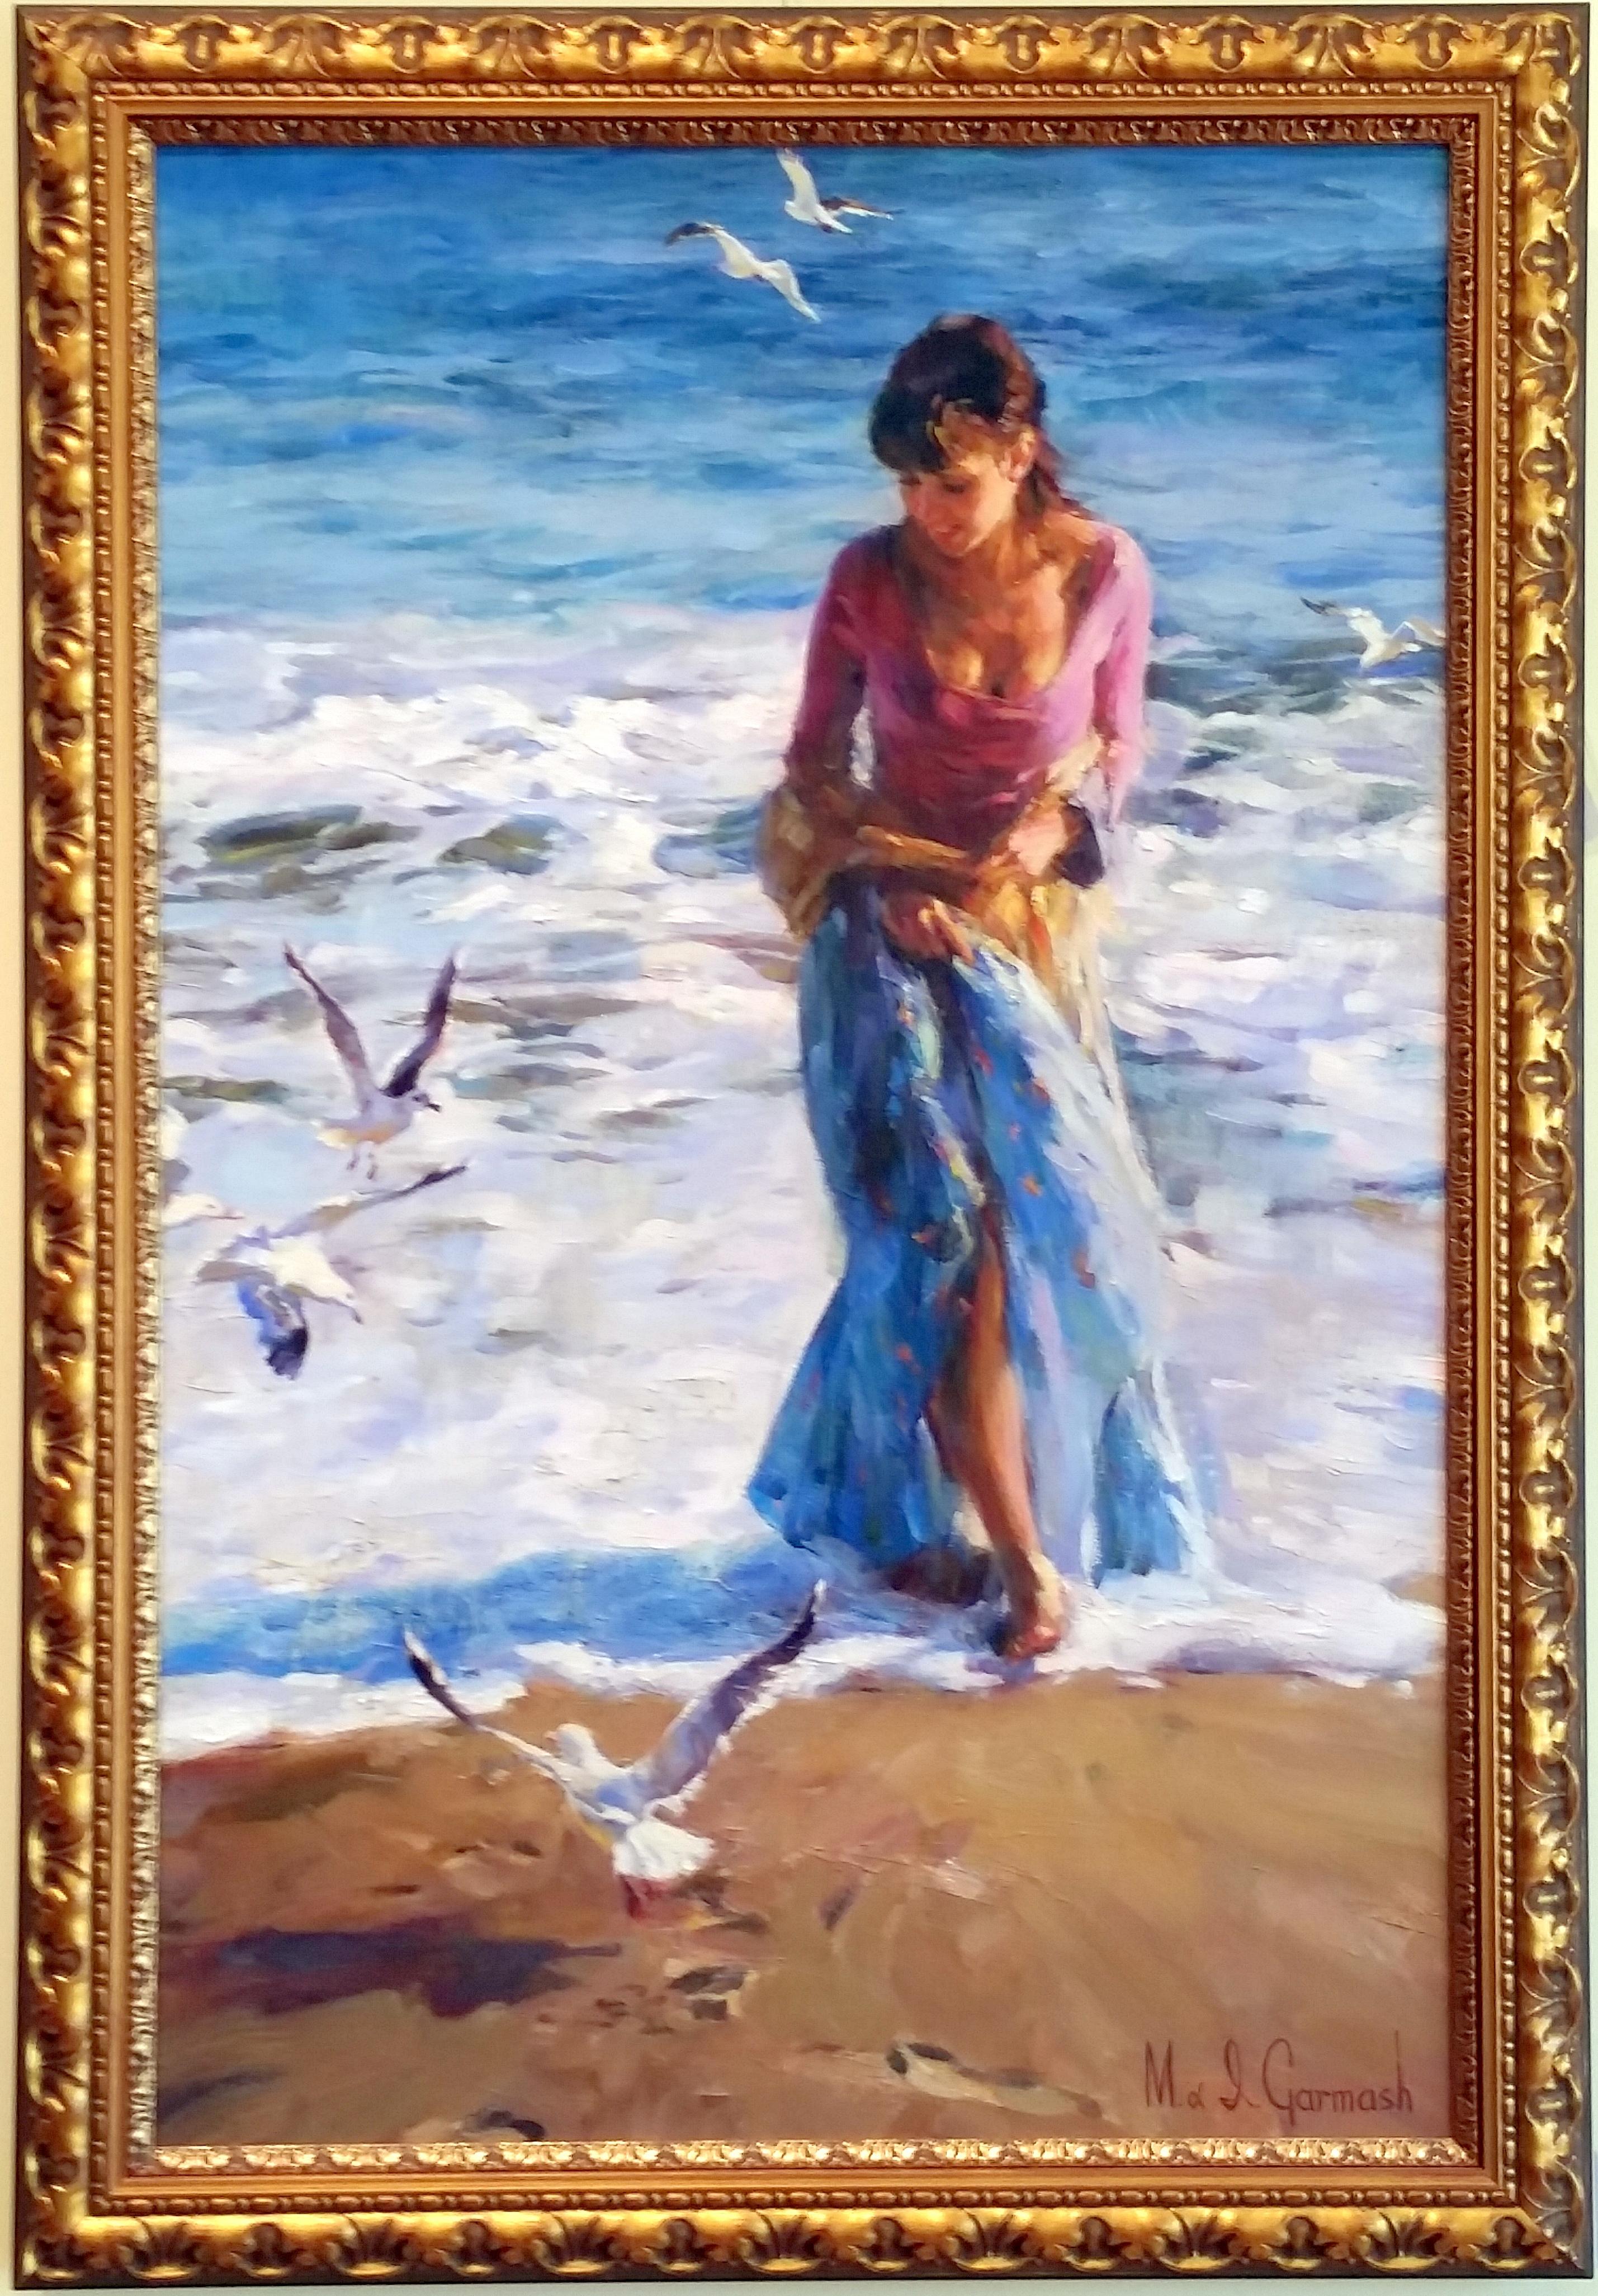 Mon Cheri, Irene Sheri, figurative, impressionistic, beach, seaside painting, oil on canvas, Garmash artists, seagulls, walk